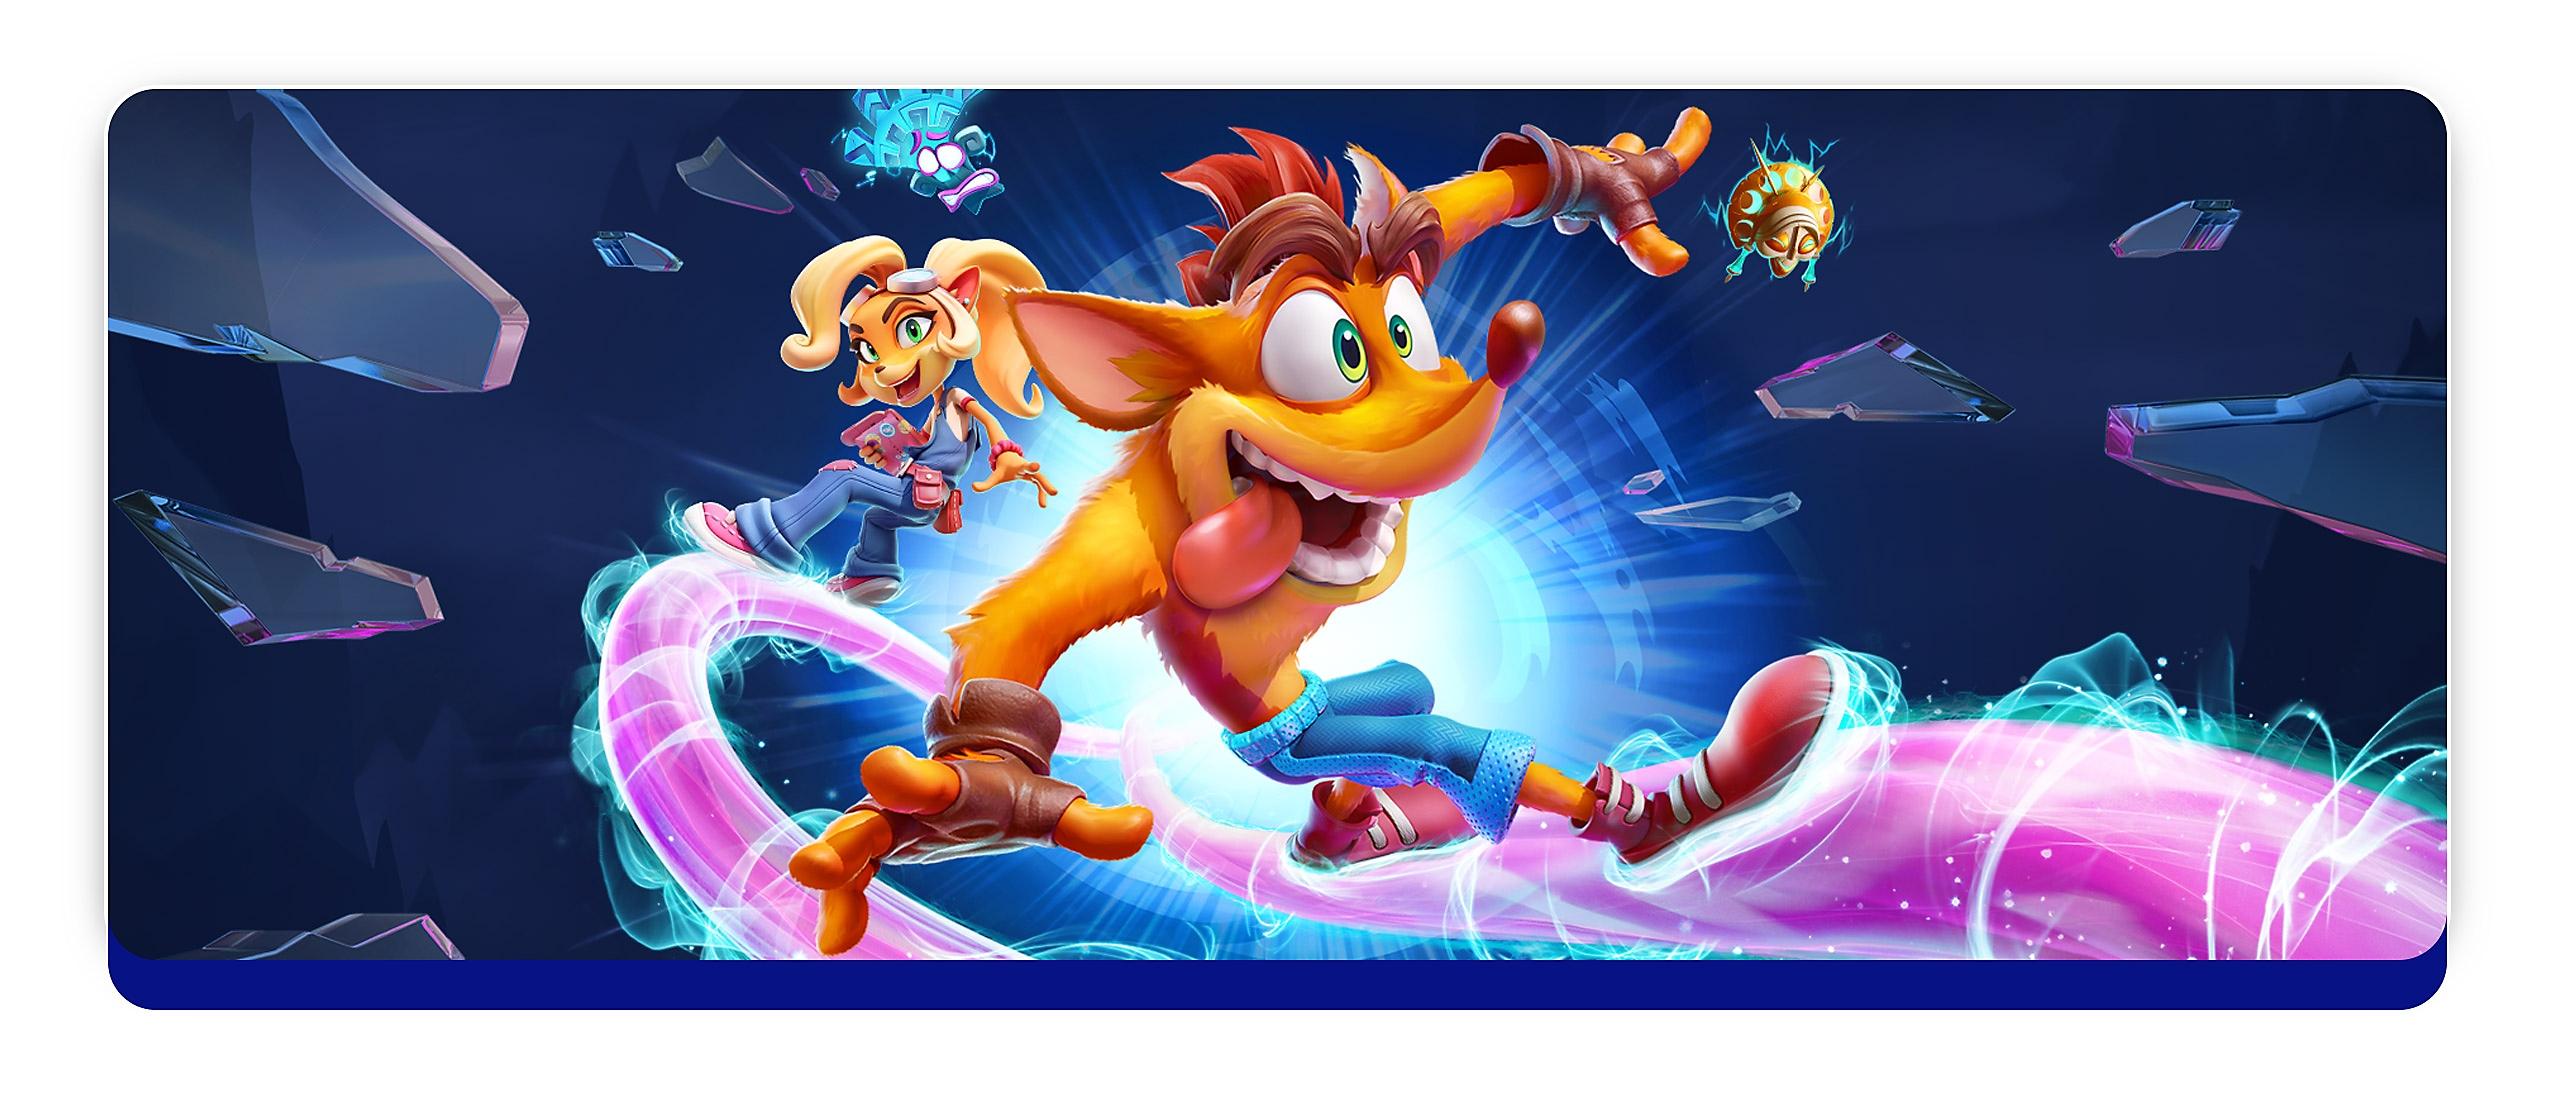 Crash Bandicoot 4: It's about time - Bilder